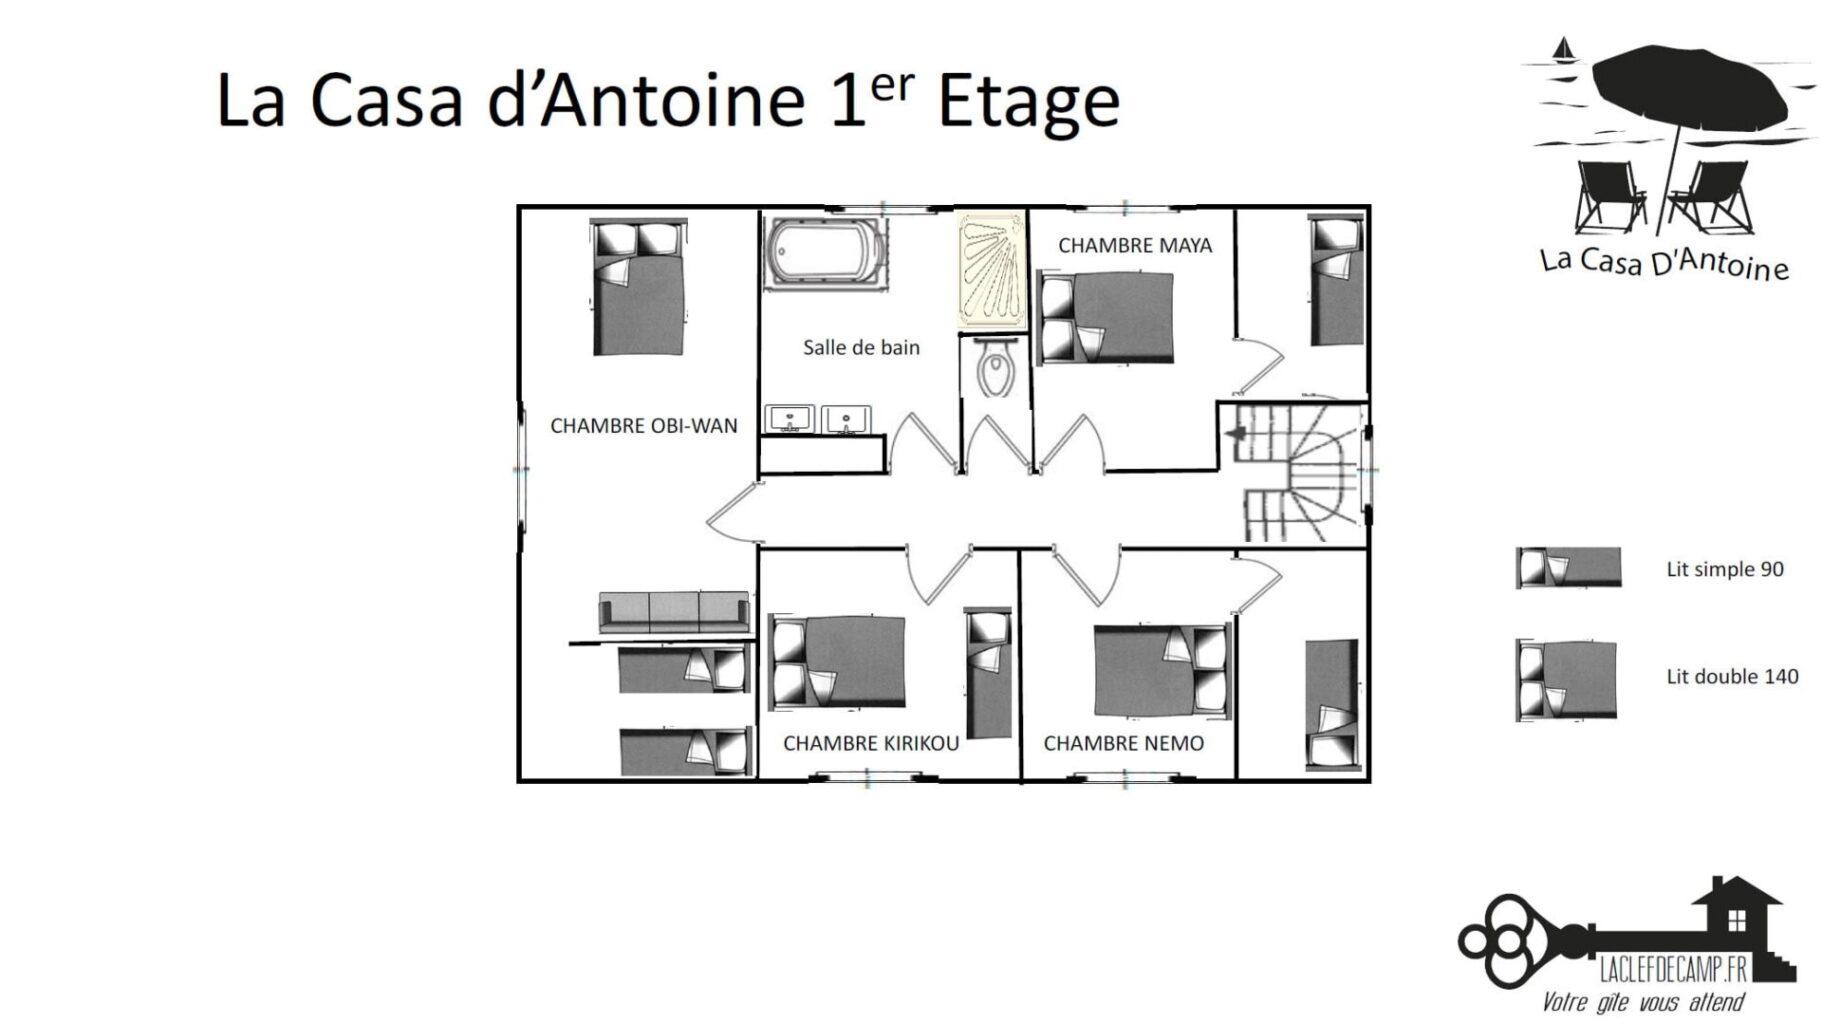 La casa d'antoine 1er